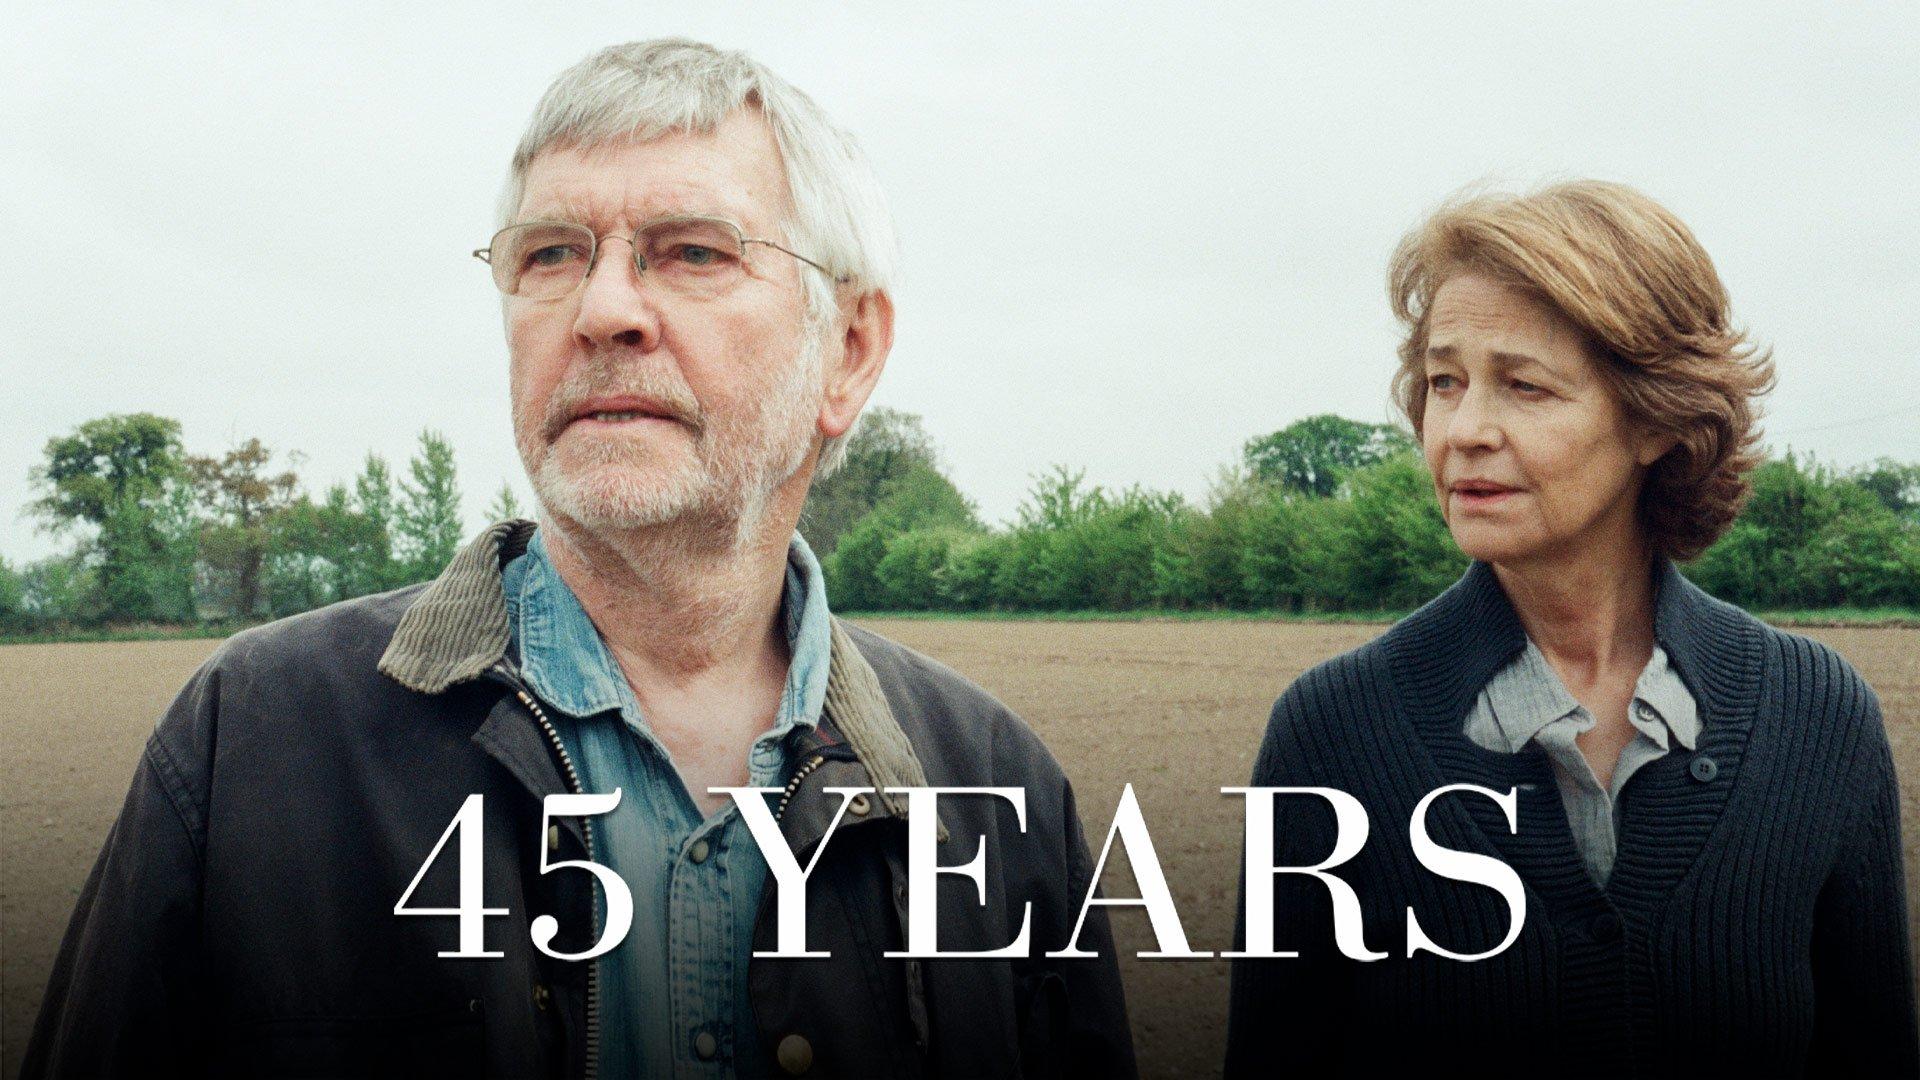 45 Years on BritBox UK